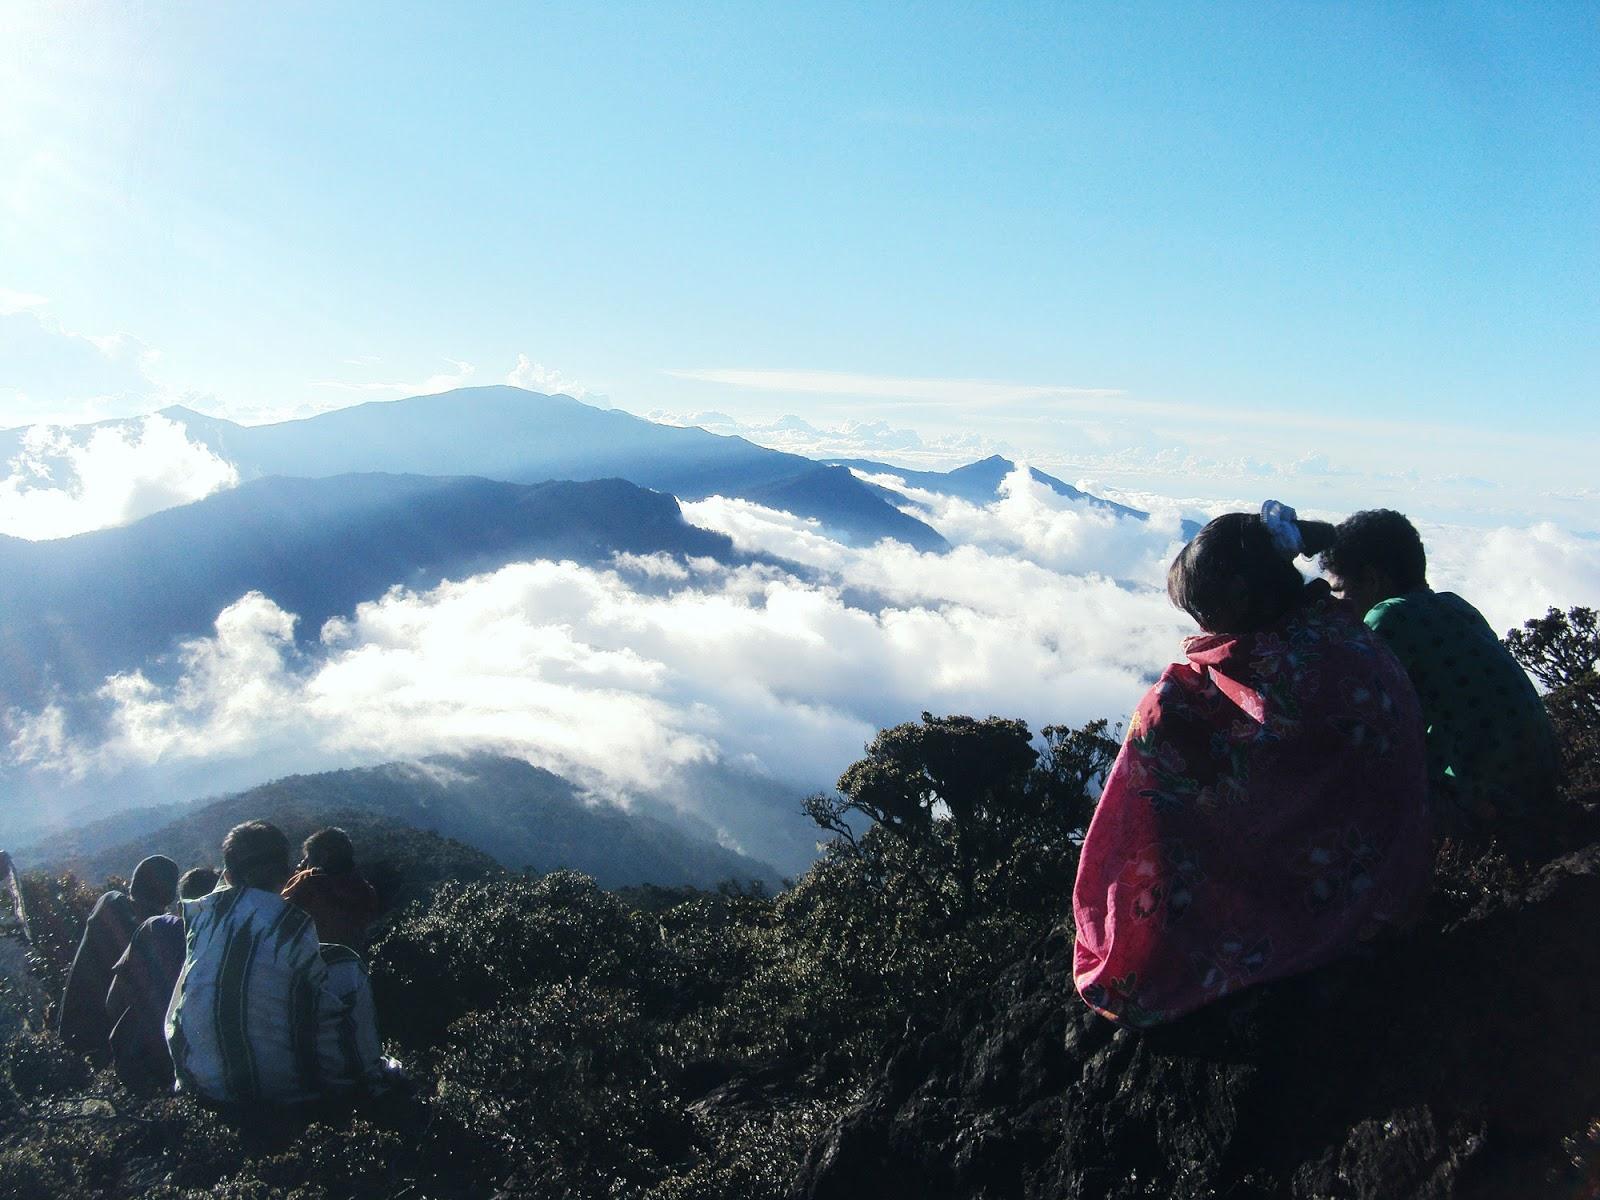 Daftar Nama Gunung Paling Angker Di Indonesia  Fahmy Ramdani